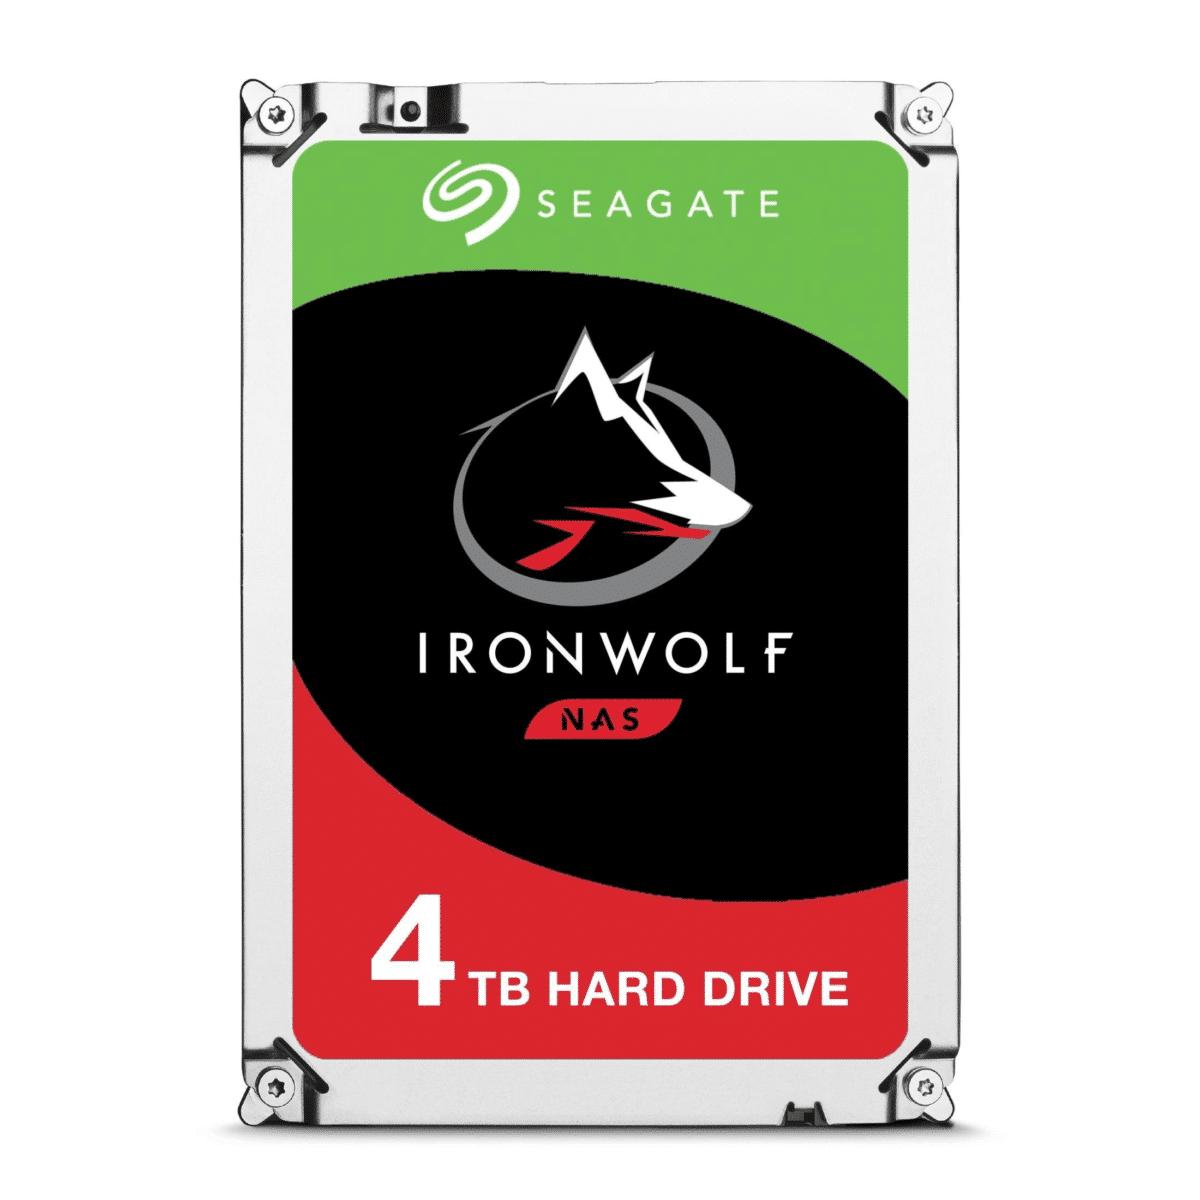 Seagate IronWolf ST4000VN008 3.5-inch 4TB Serial ATA III Internal Hard Drive